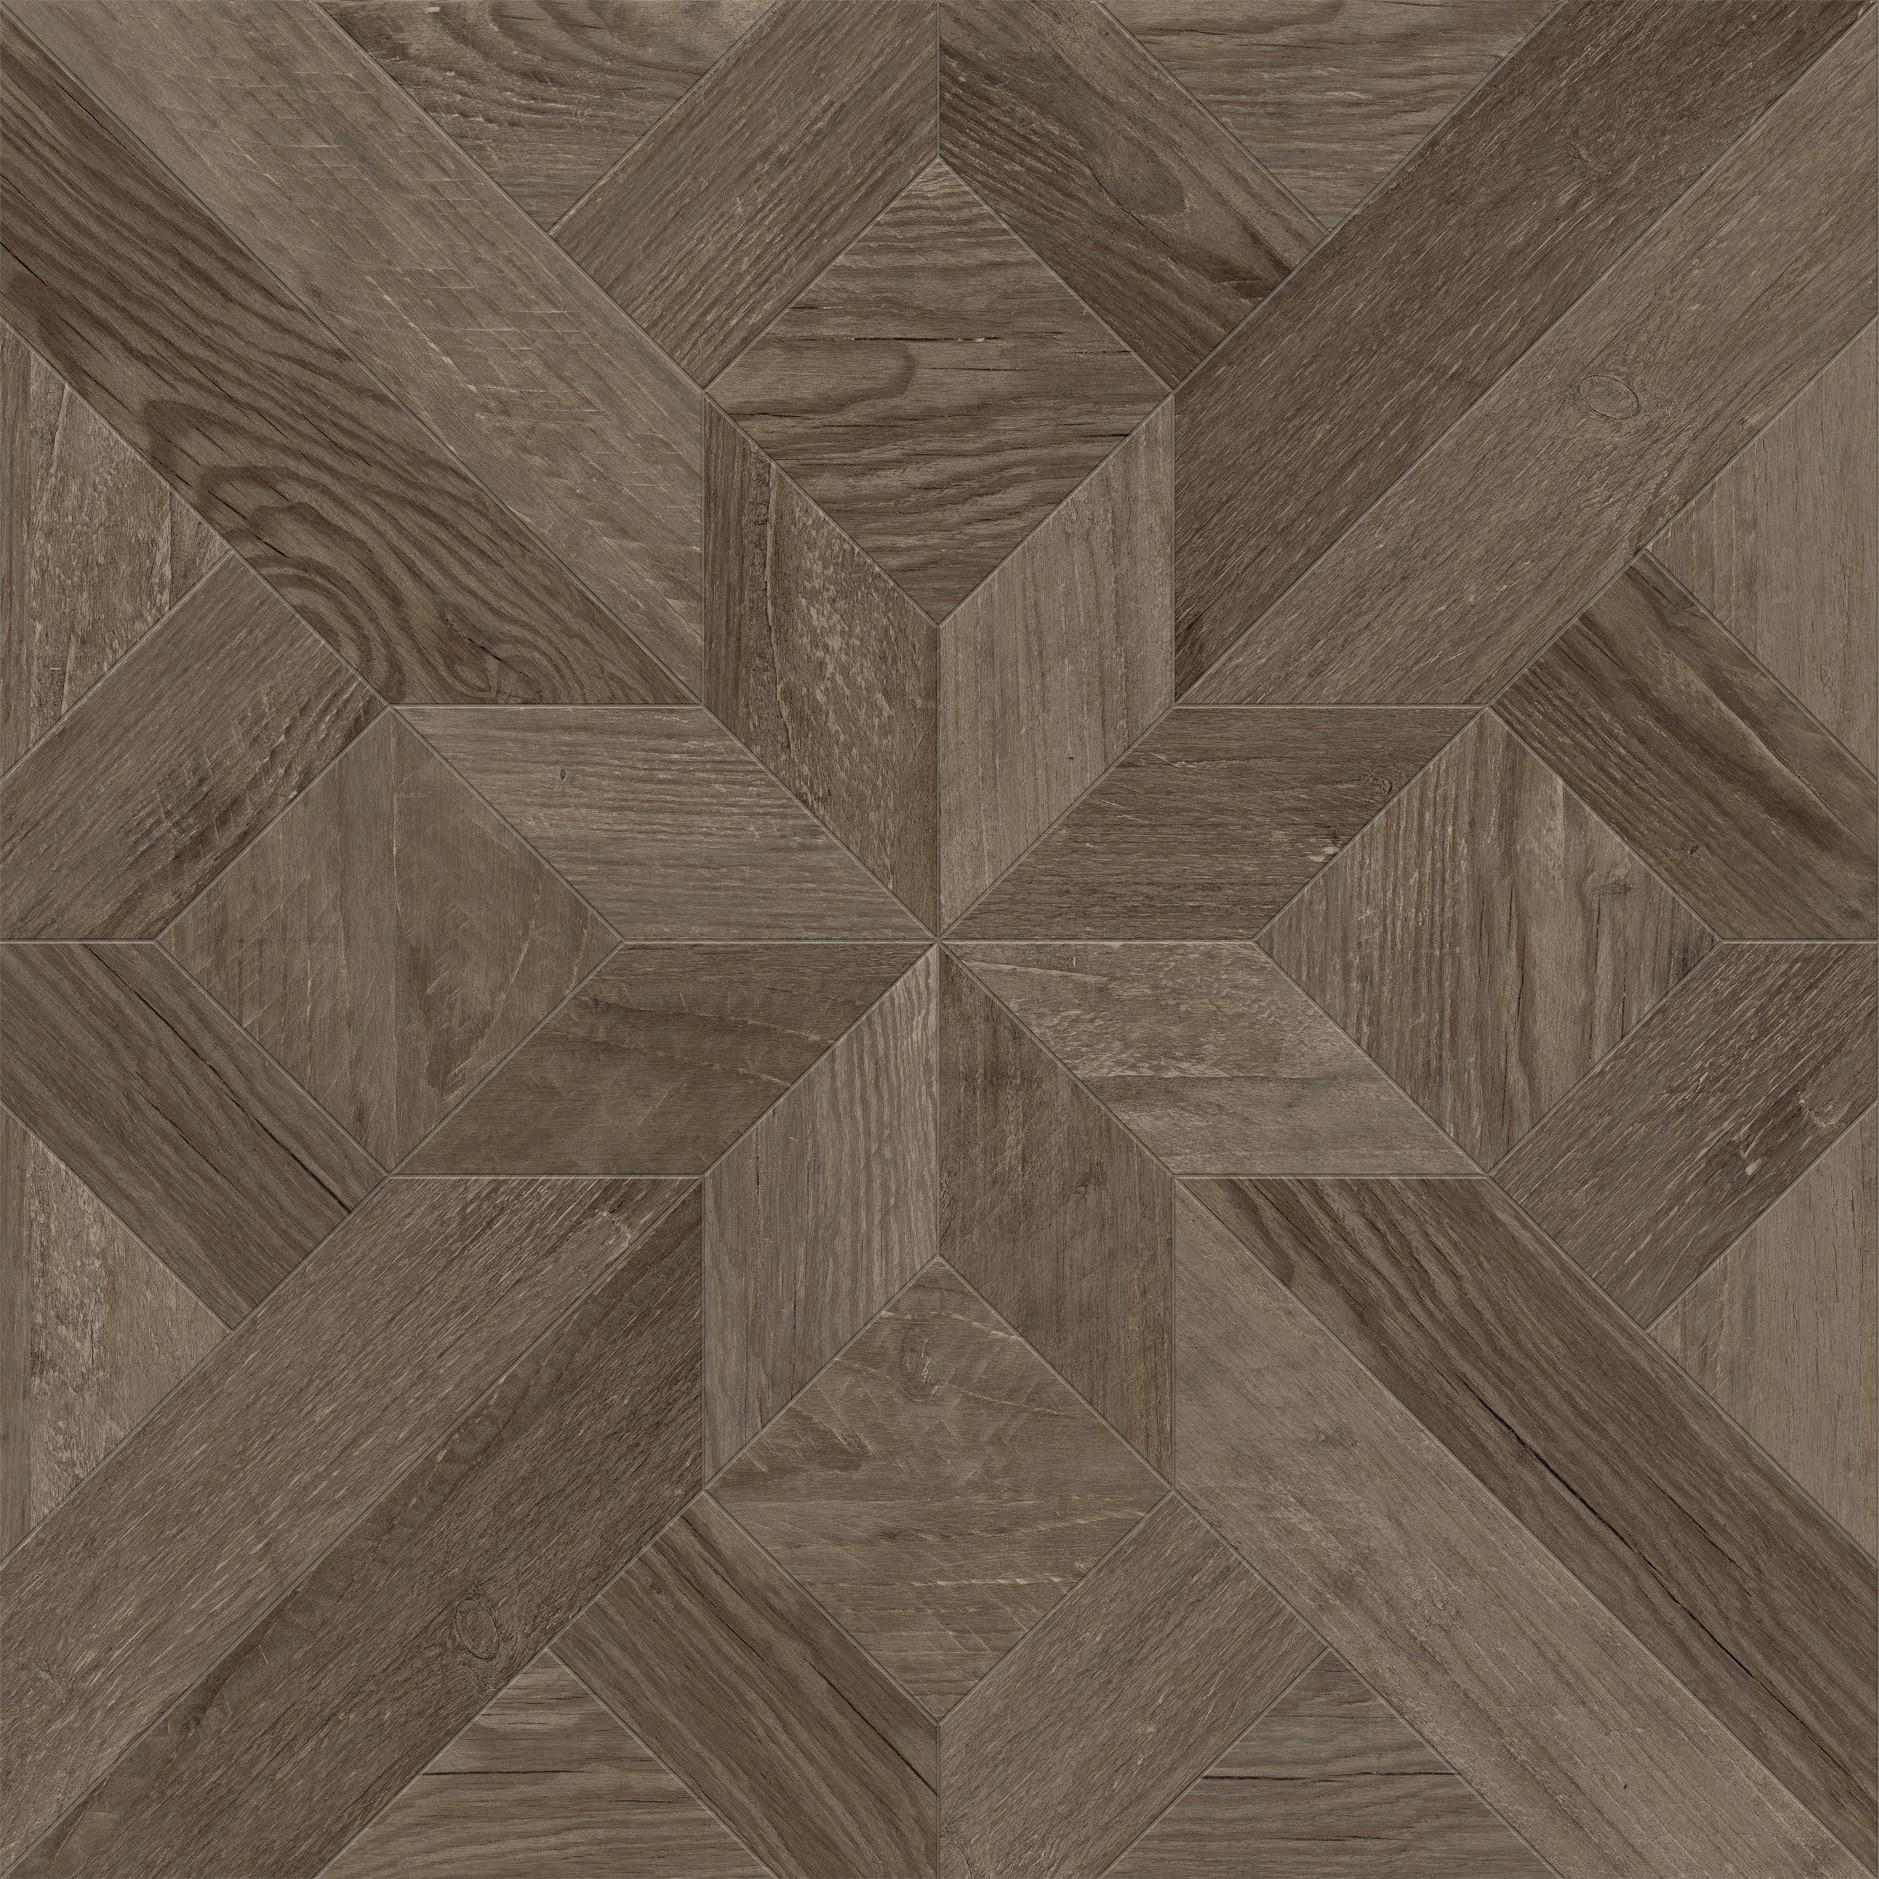 Керамограніт підлога Dubrava 60.4х60.4 brown